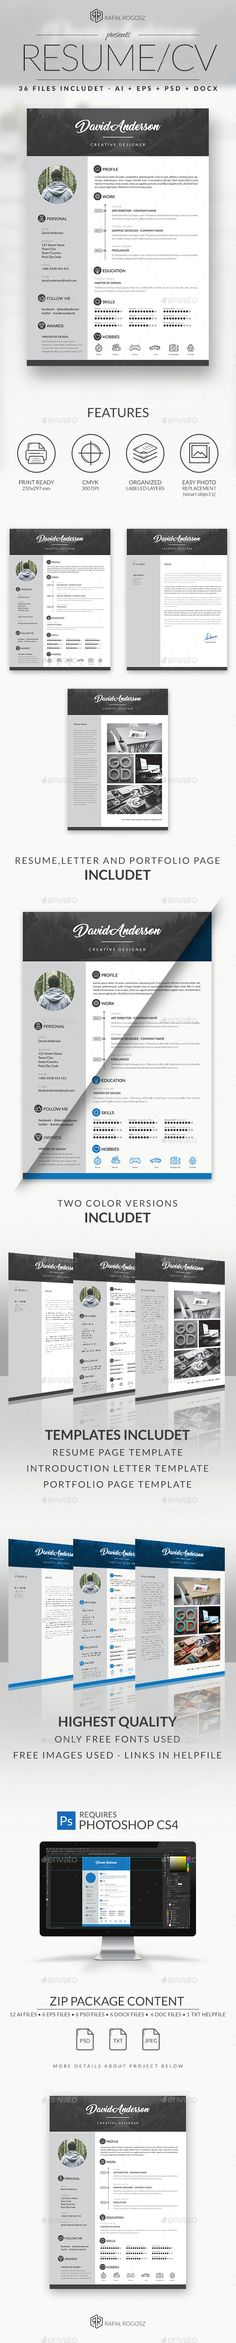 Modern Resume Bundle Print Templates - Stationery Pinterest - illustrator resume templates